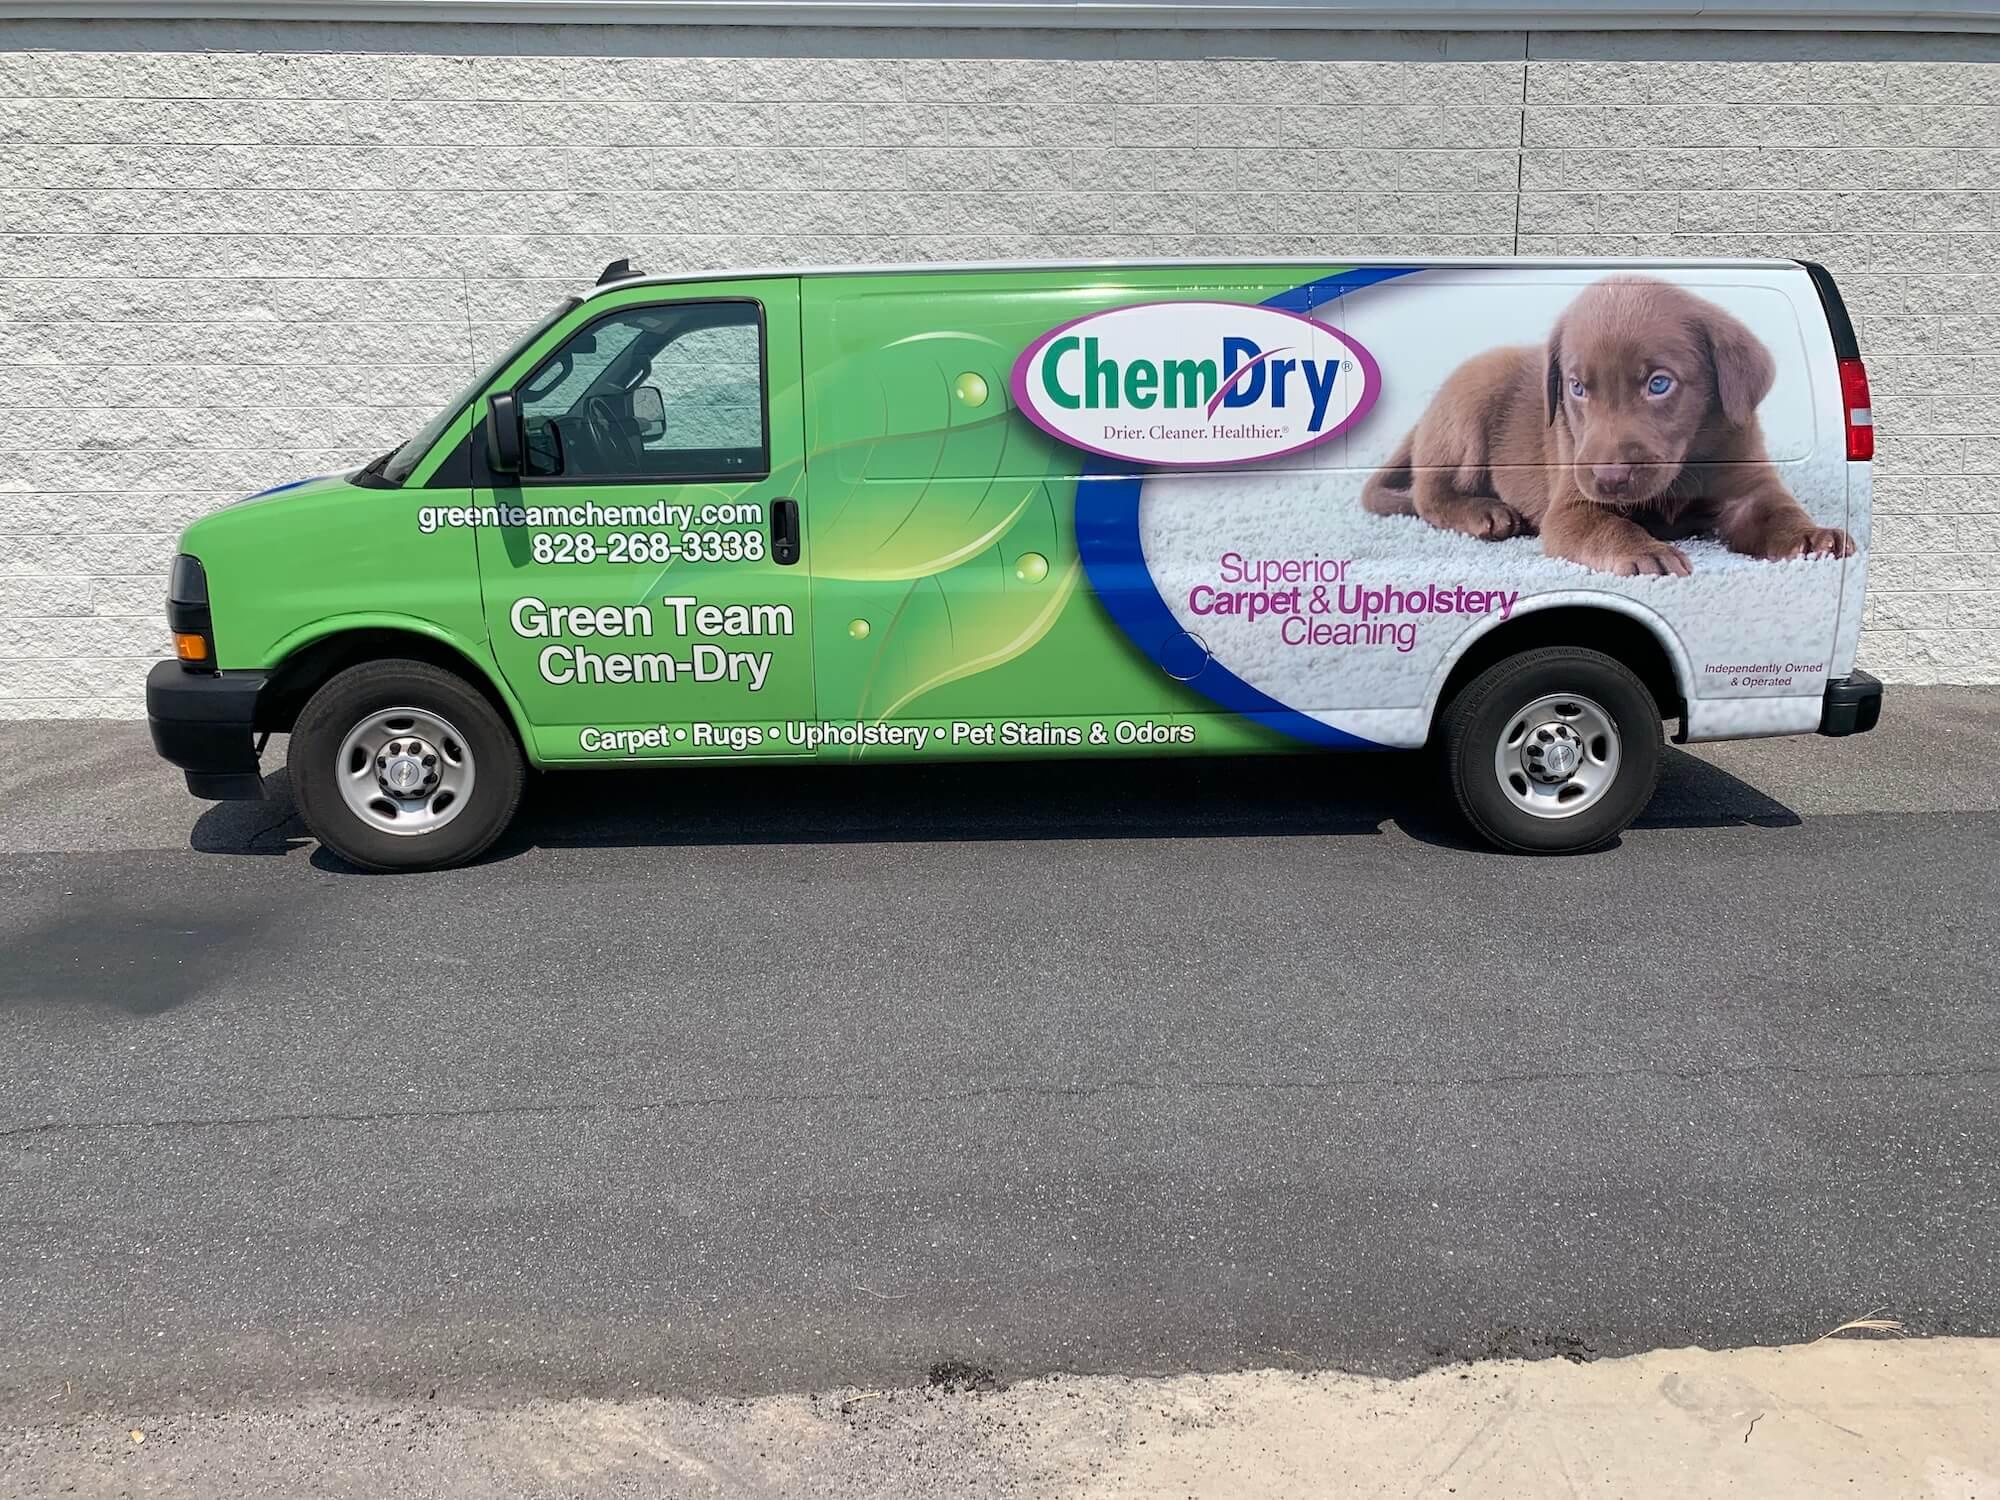 green team chem-dry carpet cleaning van